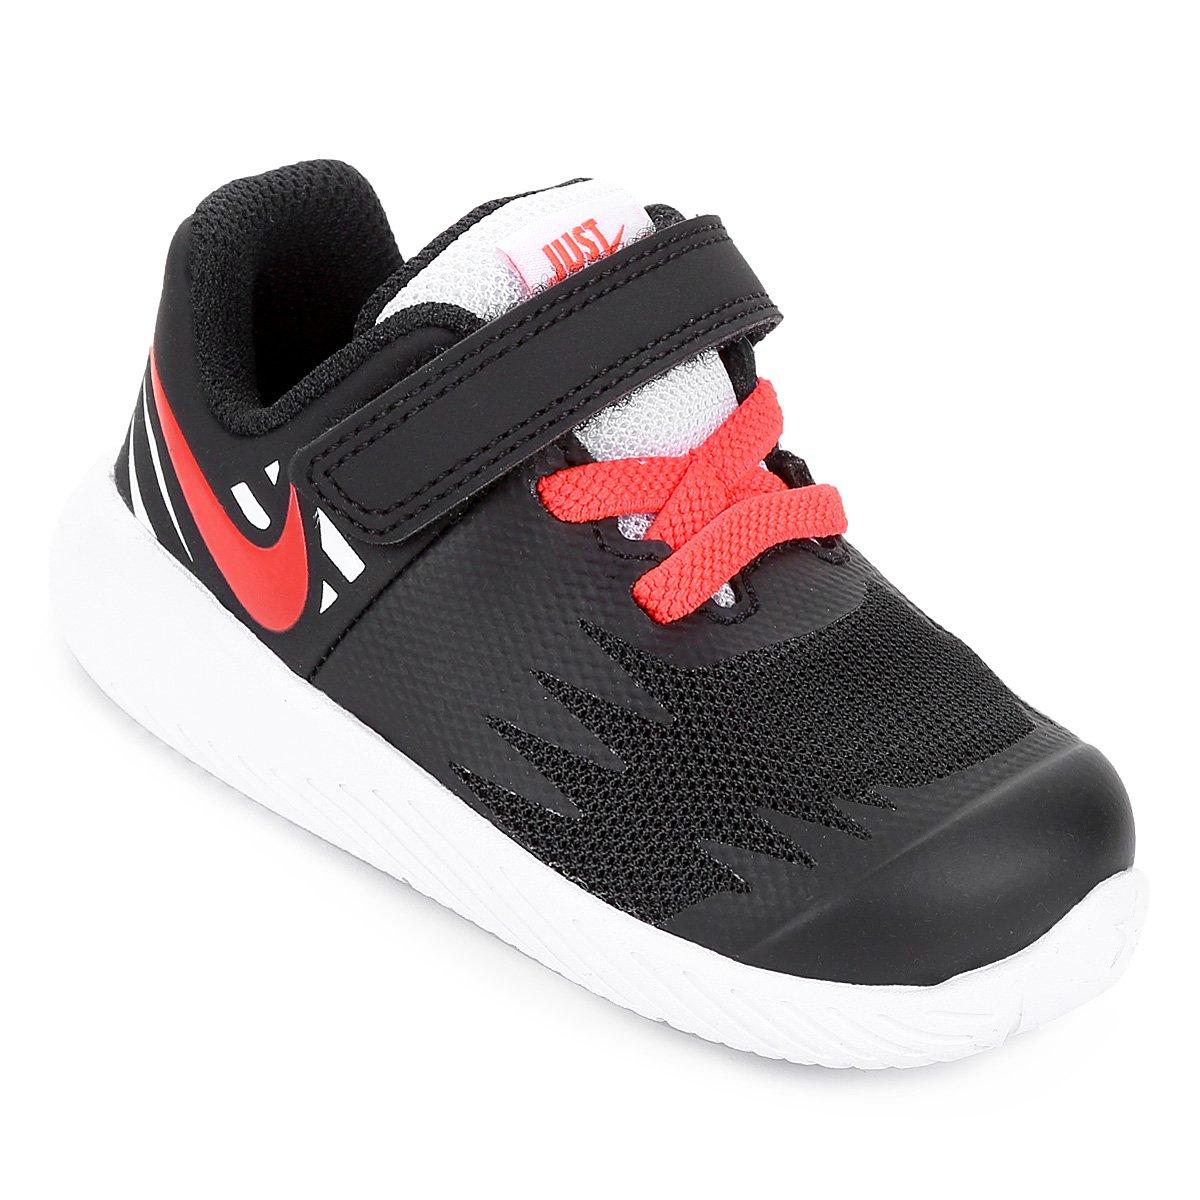 41cc8d4f5 37%OFF Tênis Infantil Nike Star Runner Masculino